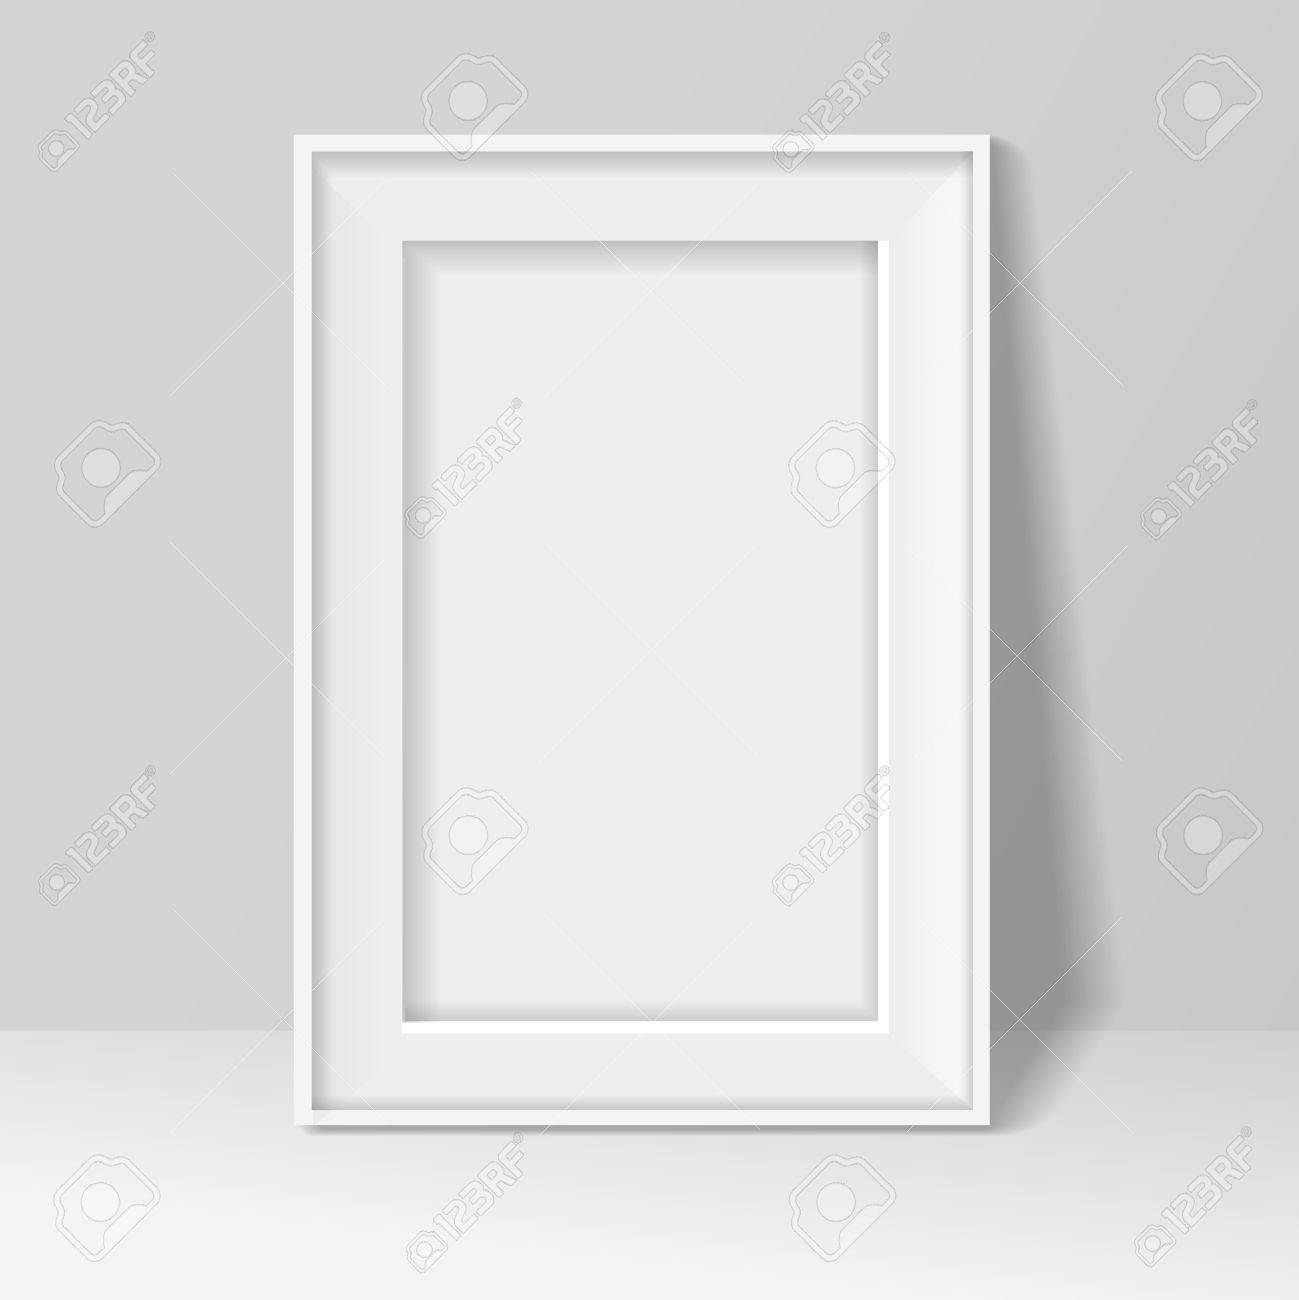 8f1170818d2 blank frame on white wall background. illustration . Stock Illustration -  40914367